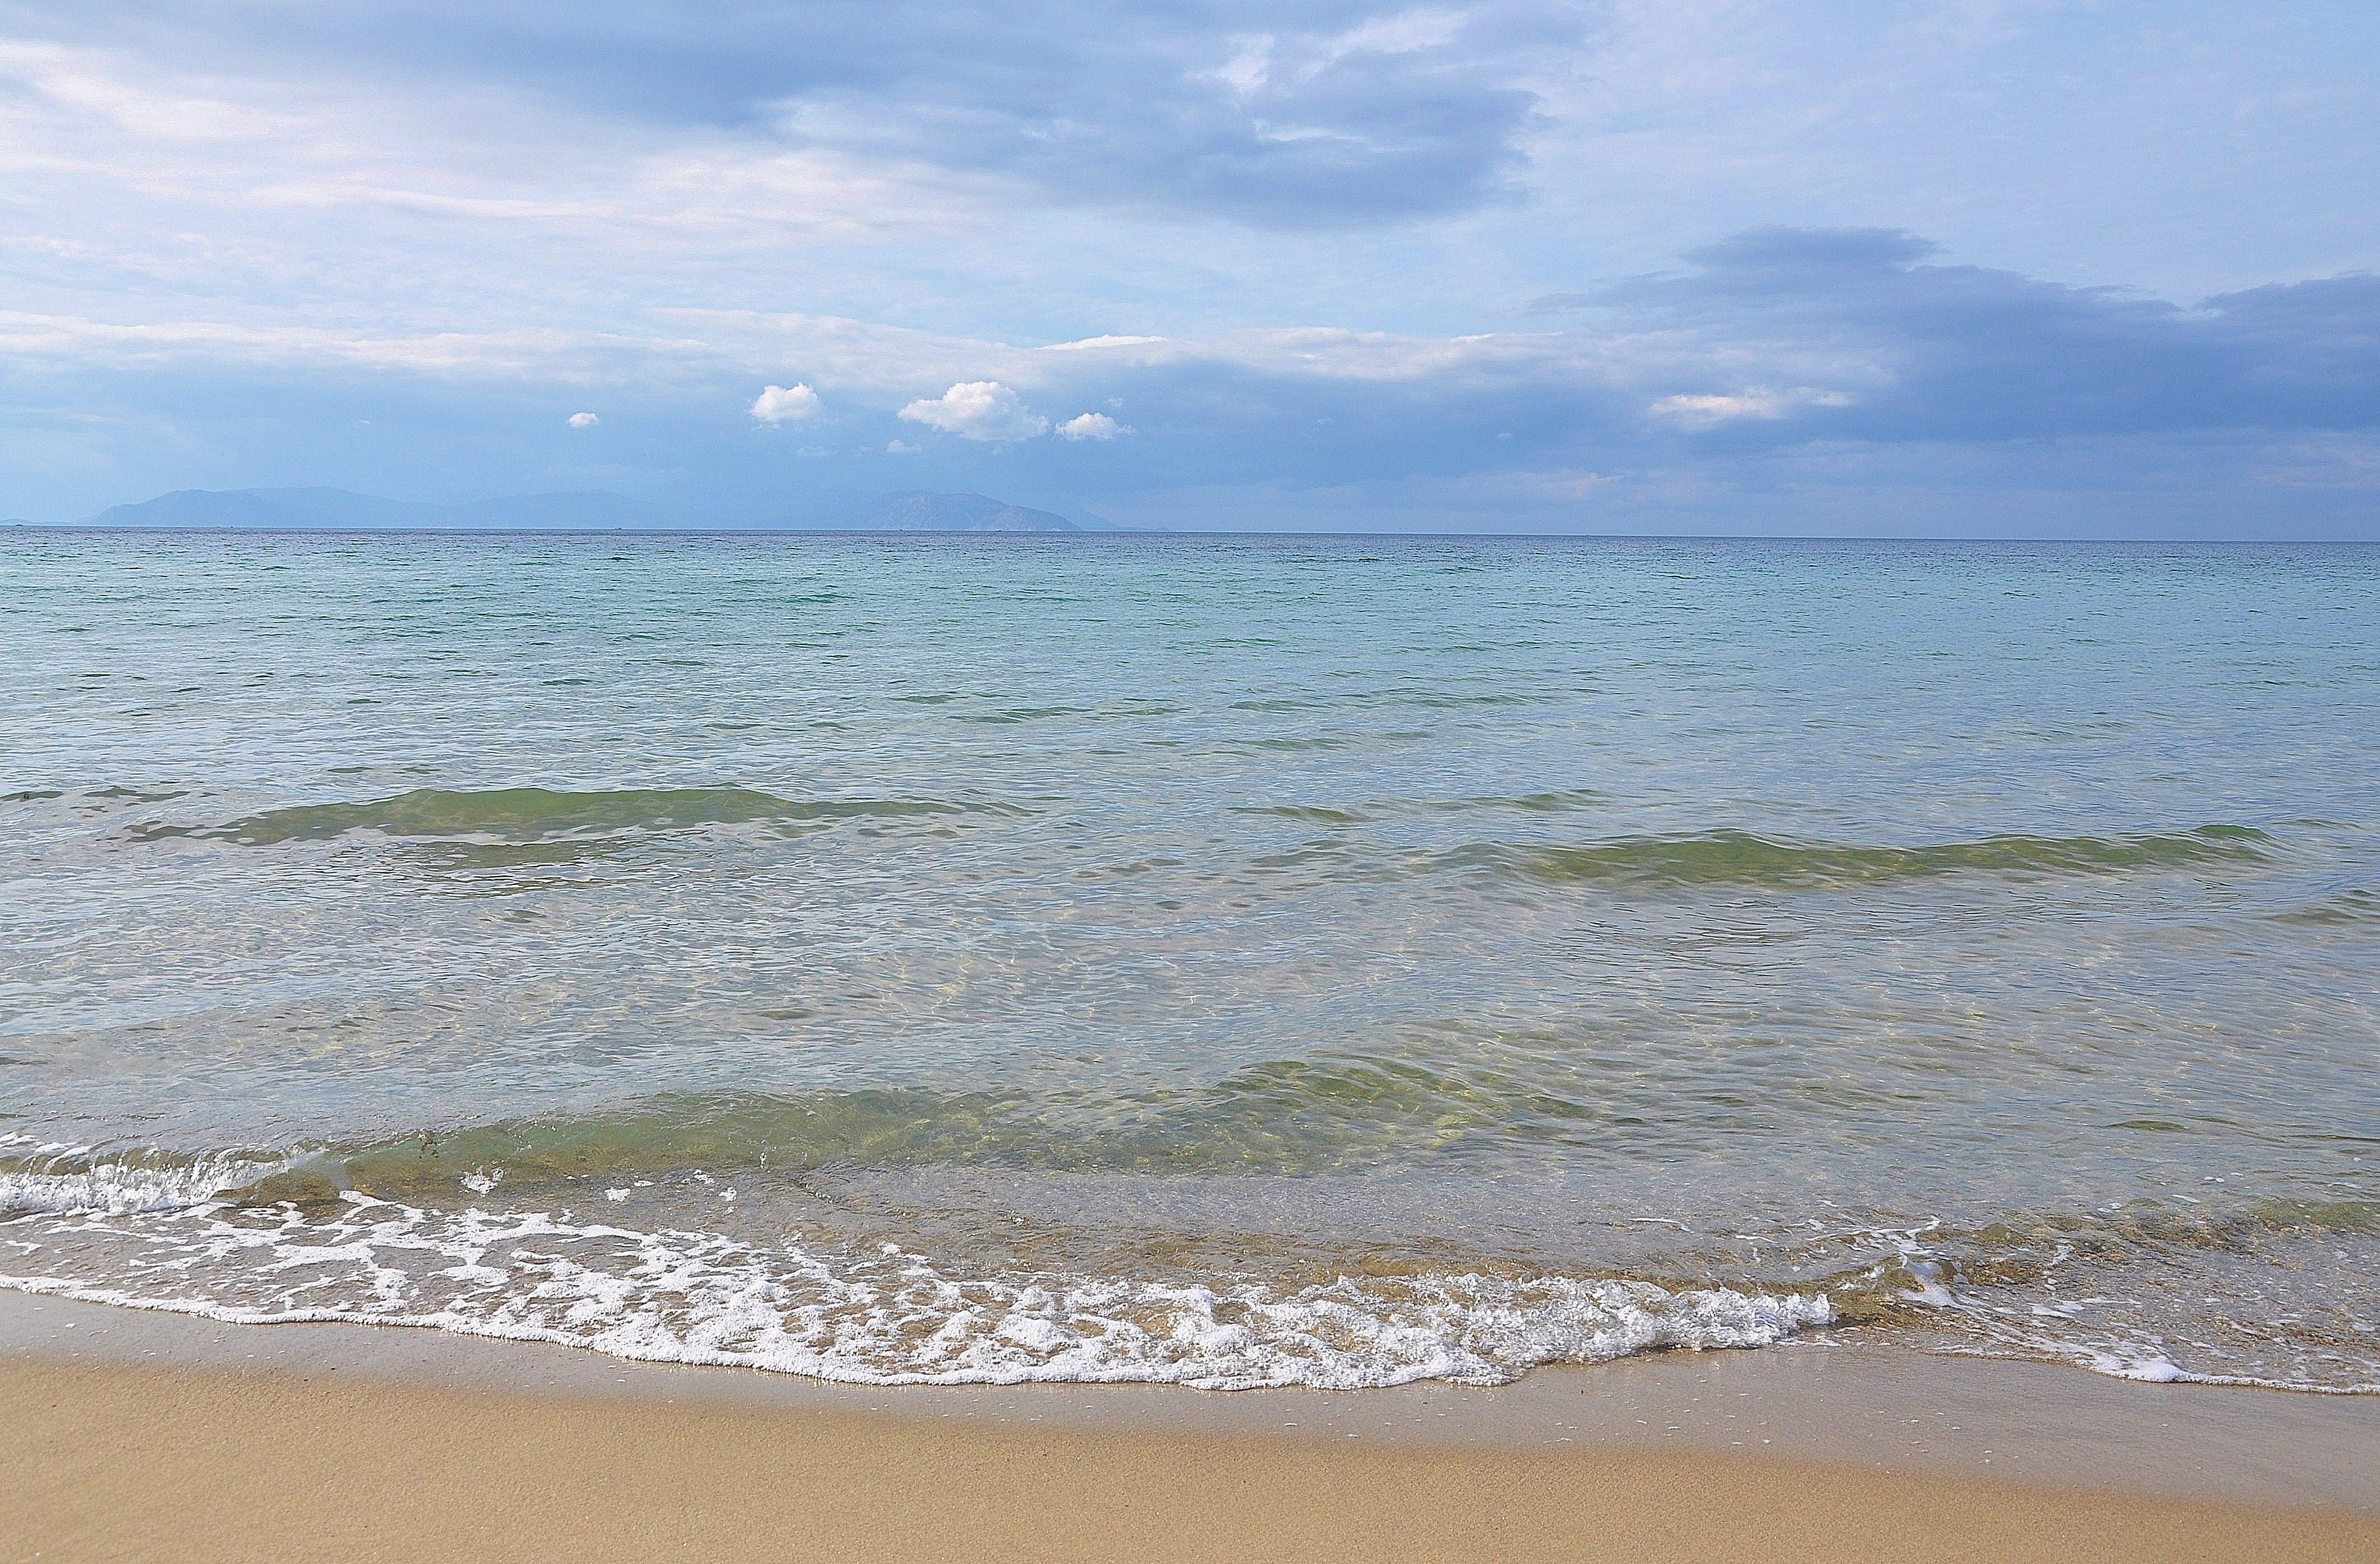 Free Images Beach Sea Coast Nature Sand Ocean Horizon Liquid Abstract Texture Shore Wet Vacation Ripple Pattern Bay Blue Material